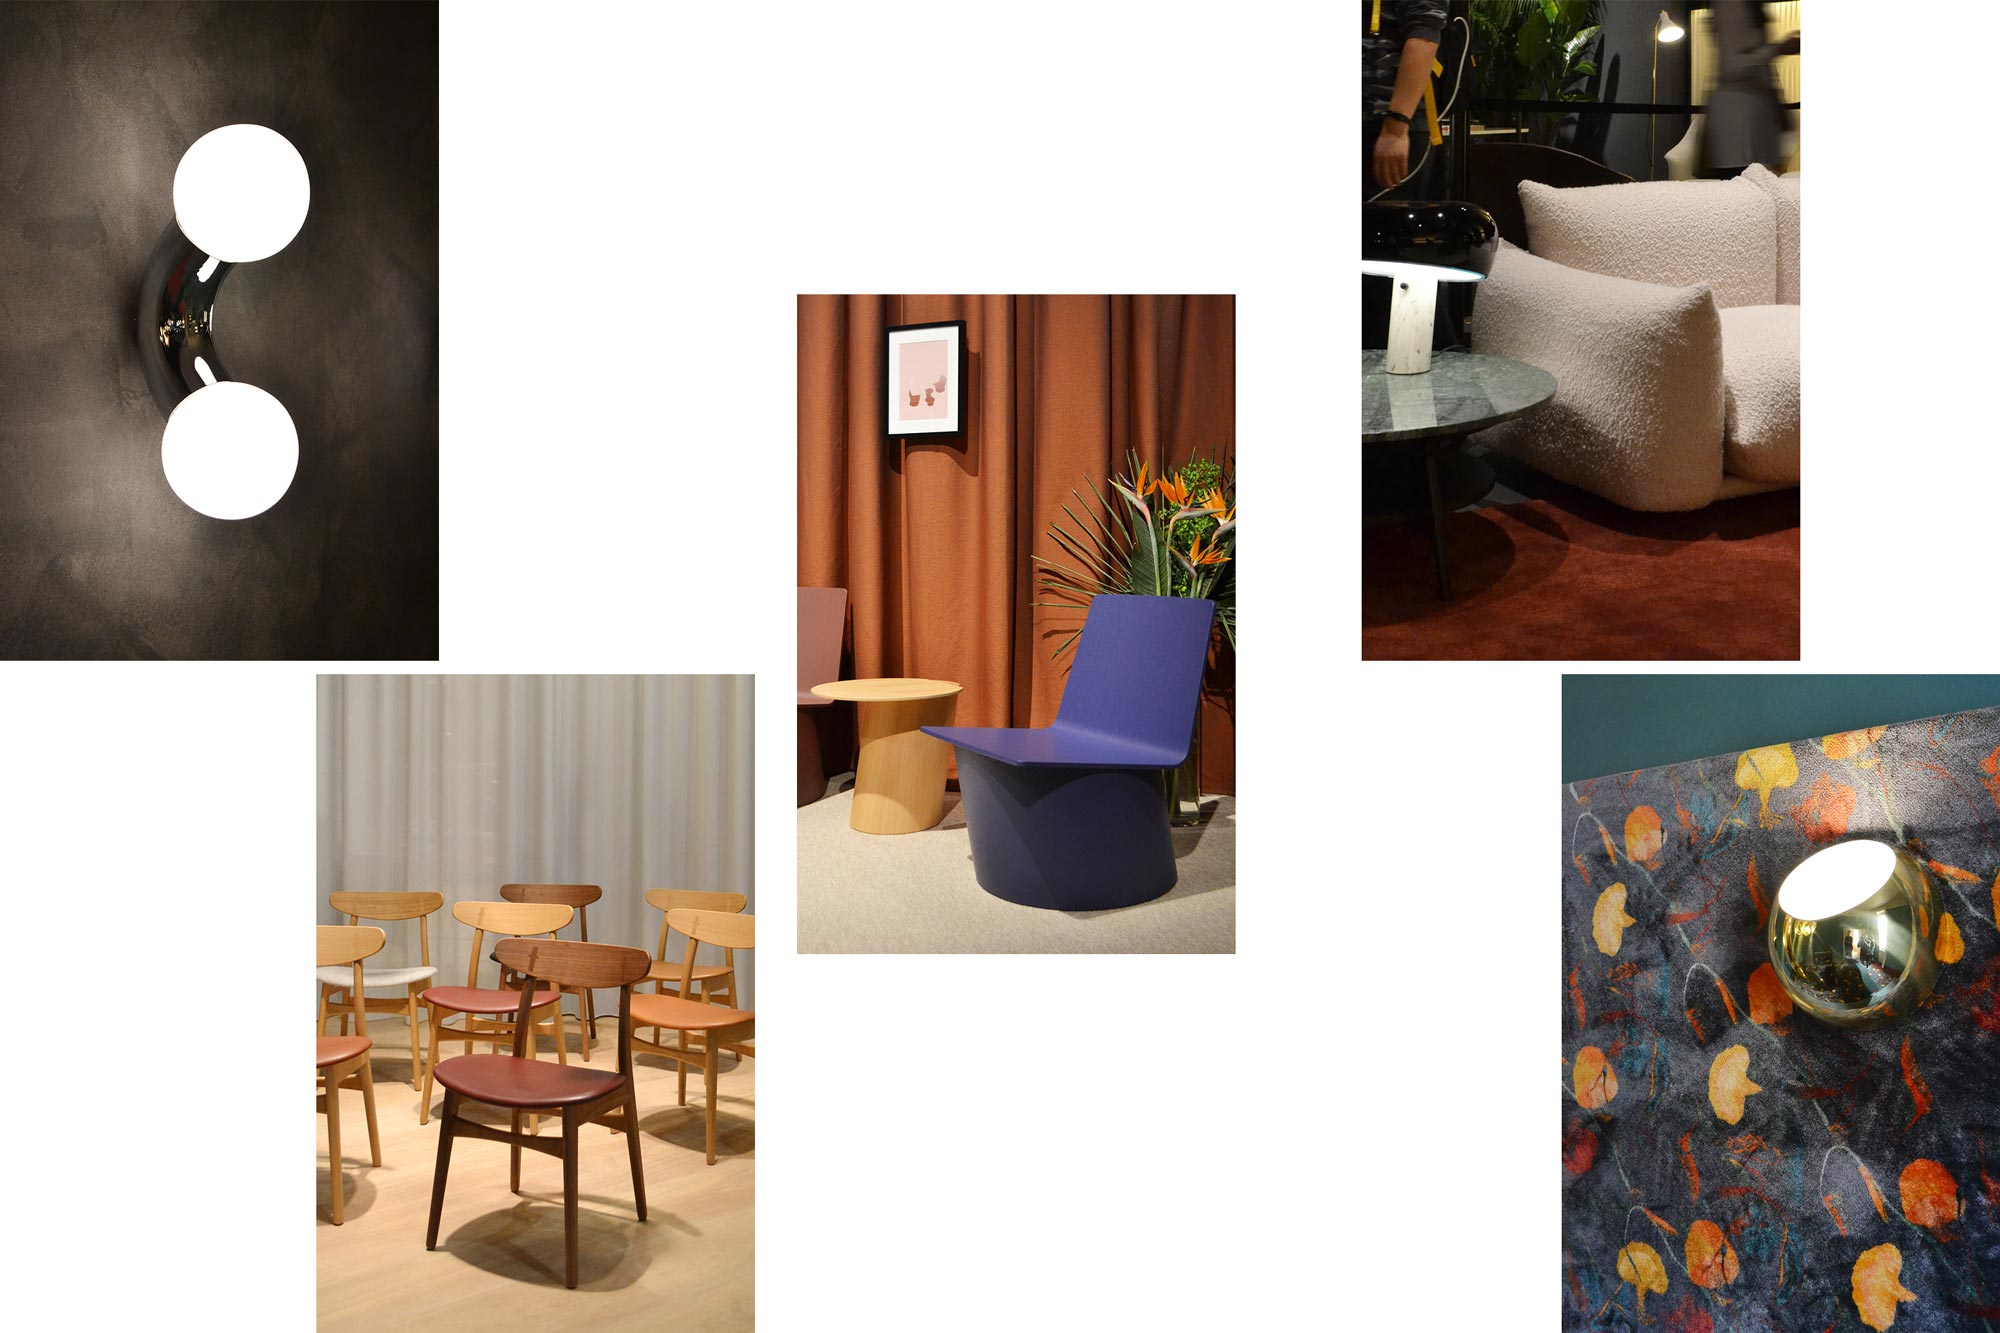 Casum Trends Salone del Mobile 2019. AndLight, Carl Hansen & Søn, Crassevig, Arflex e Besana + Esperia